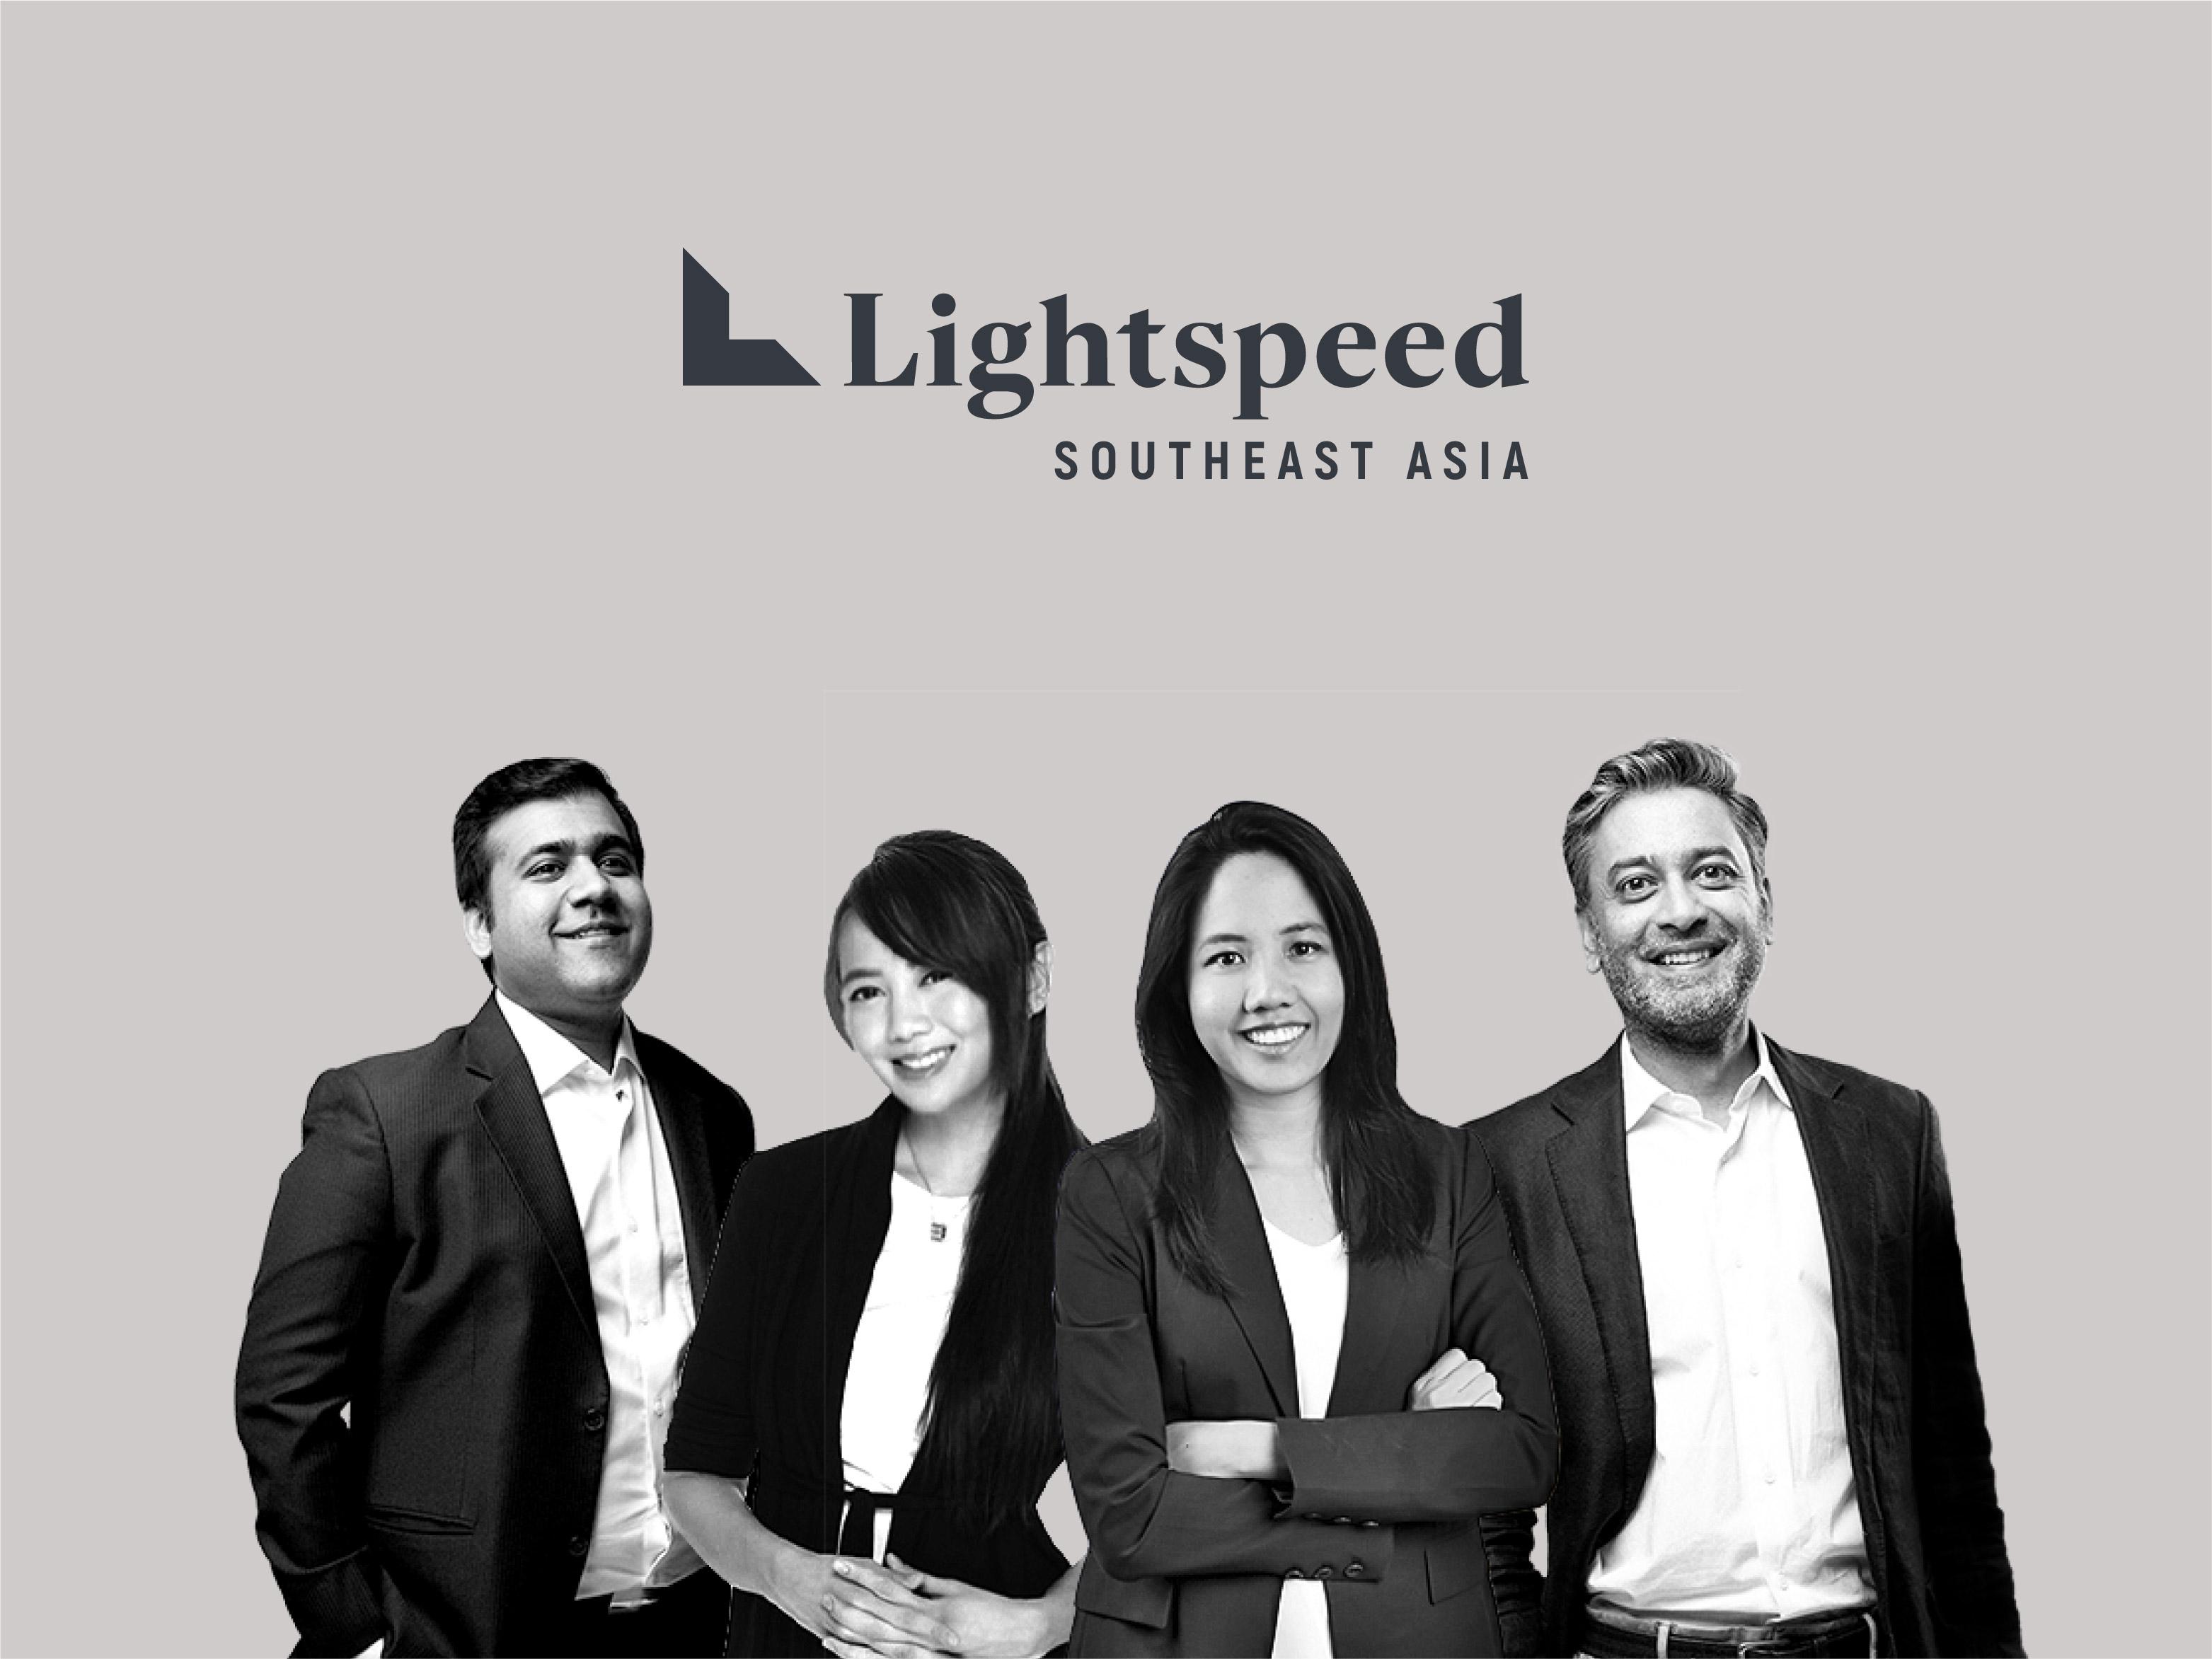 A group photo of Lightspeed Venture Capital's Southeast Asia team